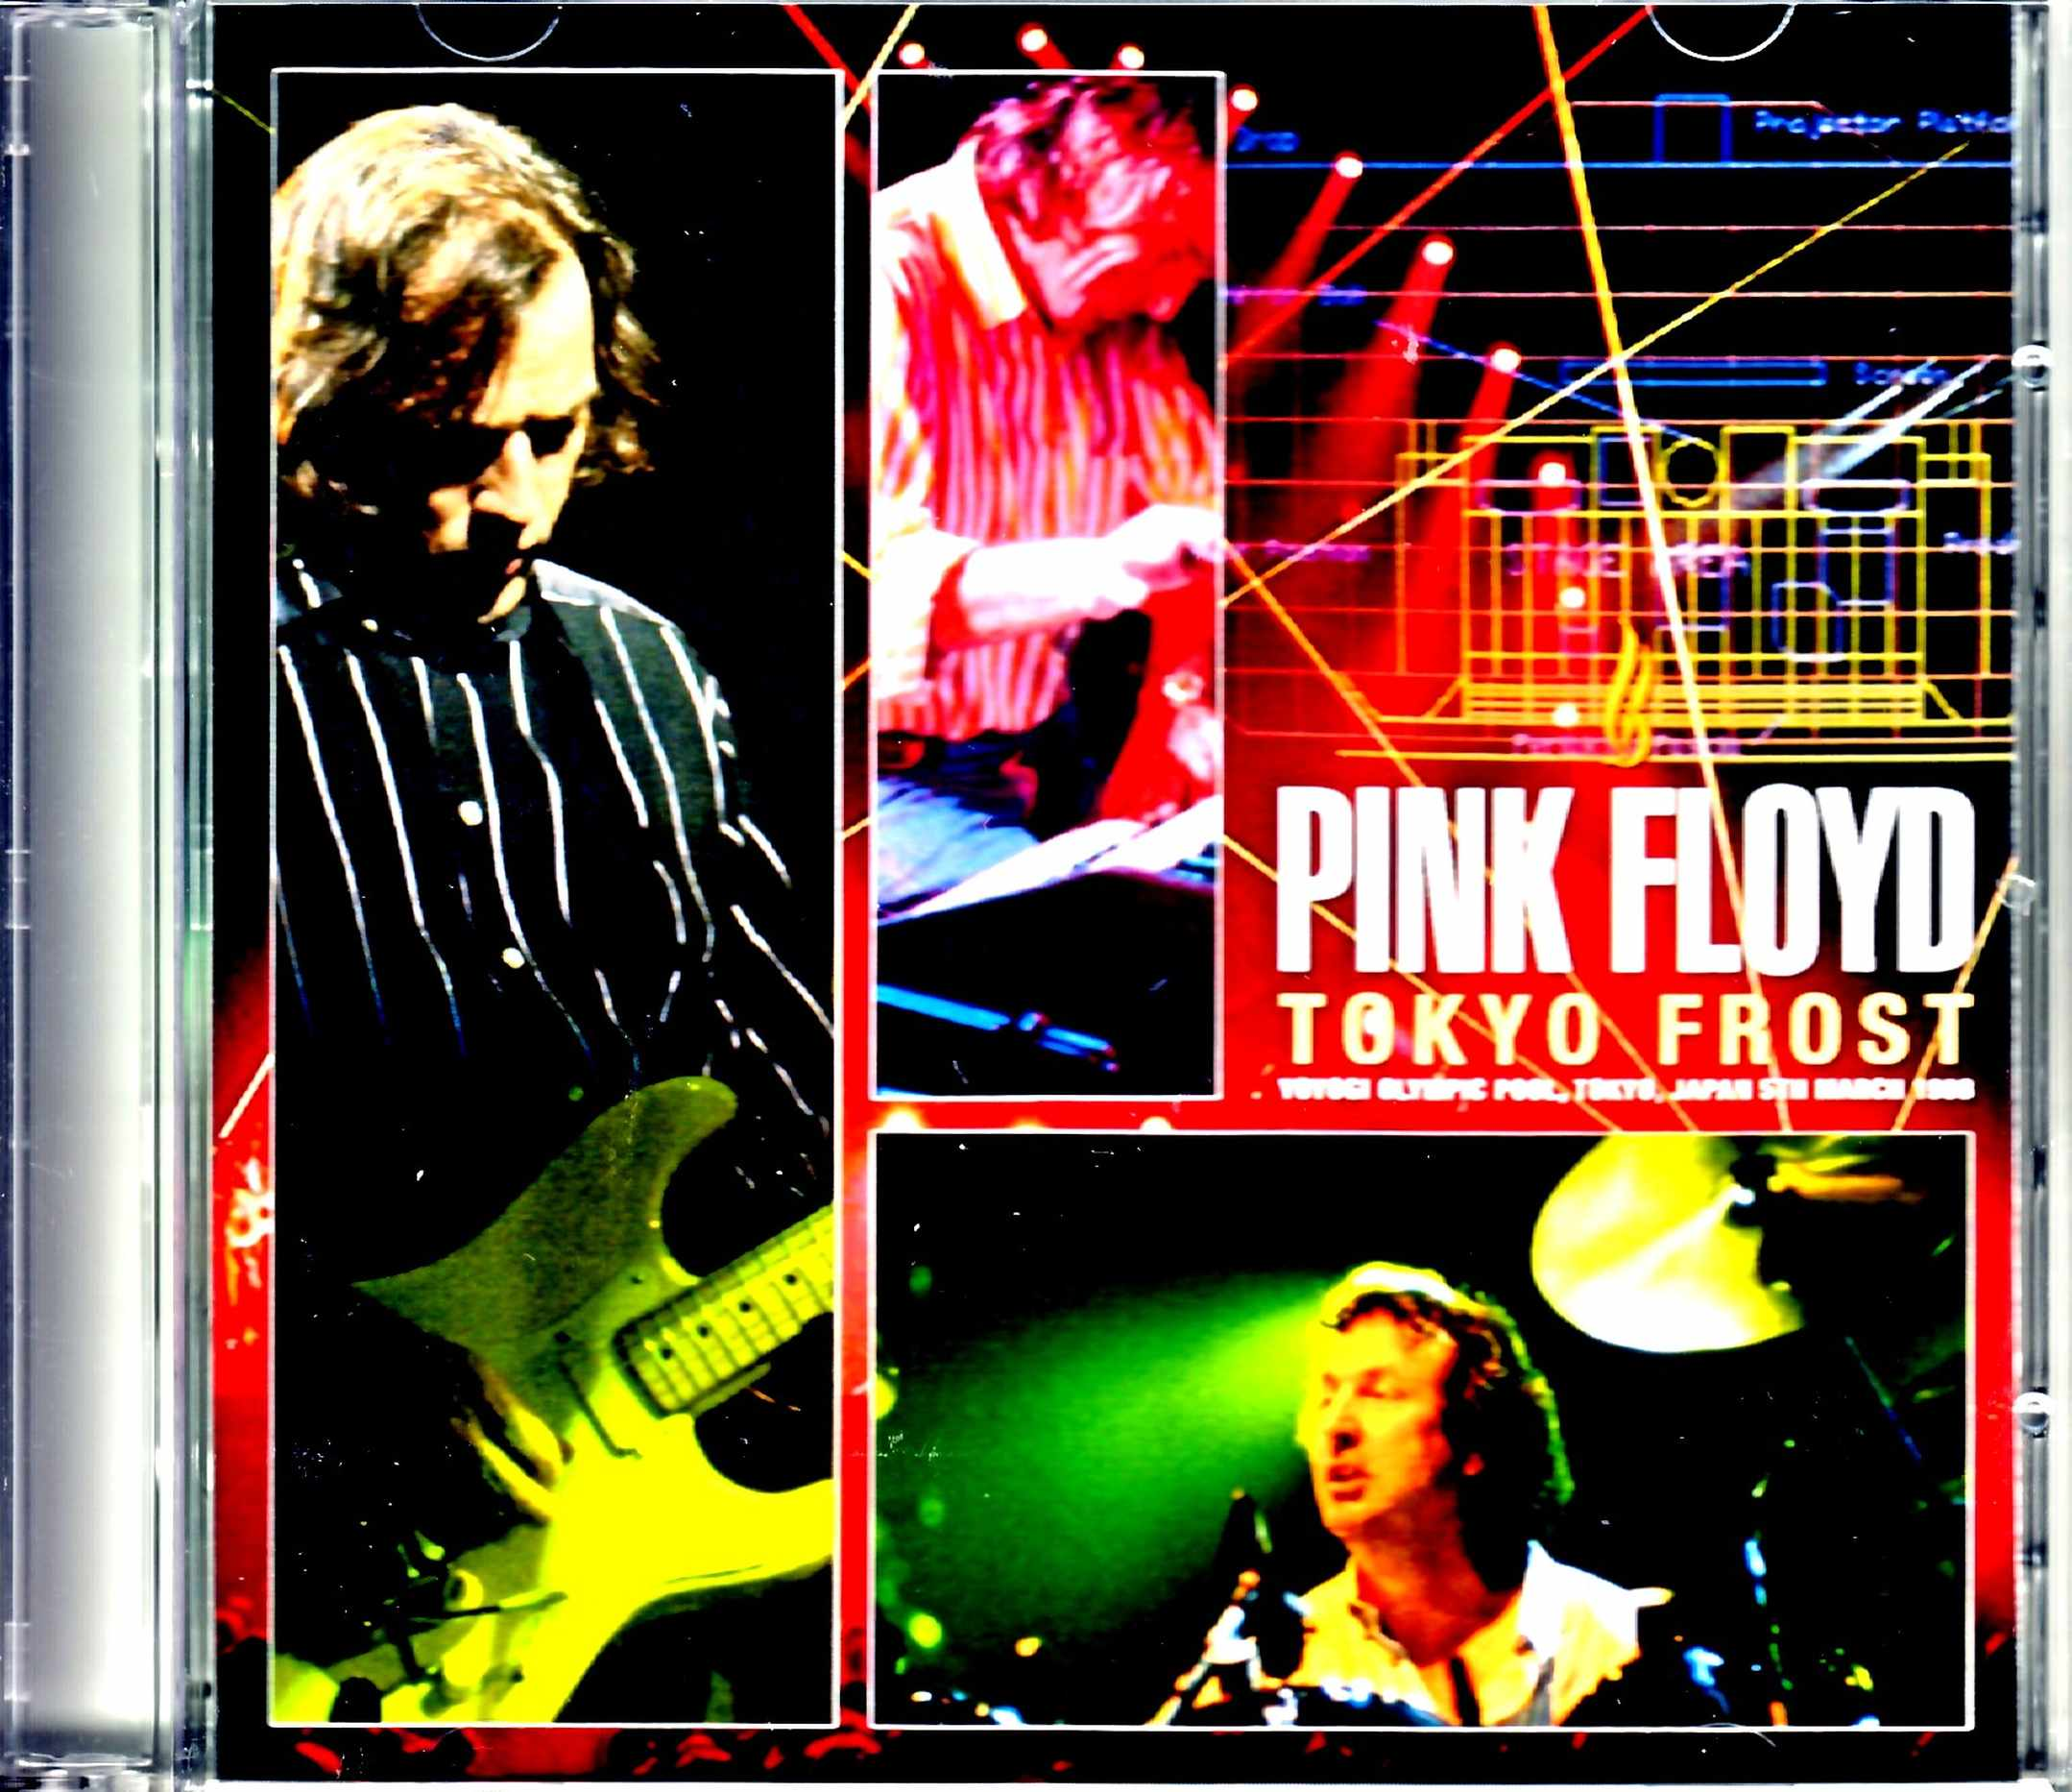 Pink Floyd ピンク・フロイド/Tokyo,Japan 3.5.1988